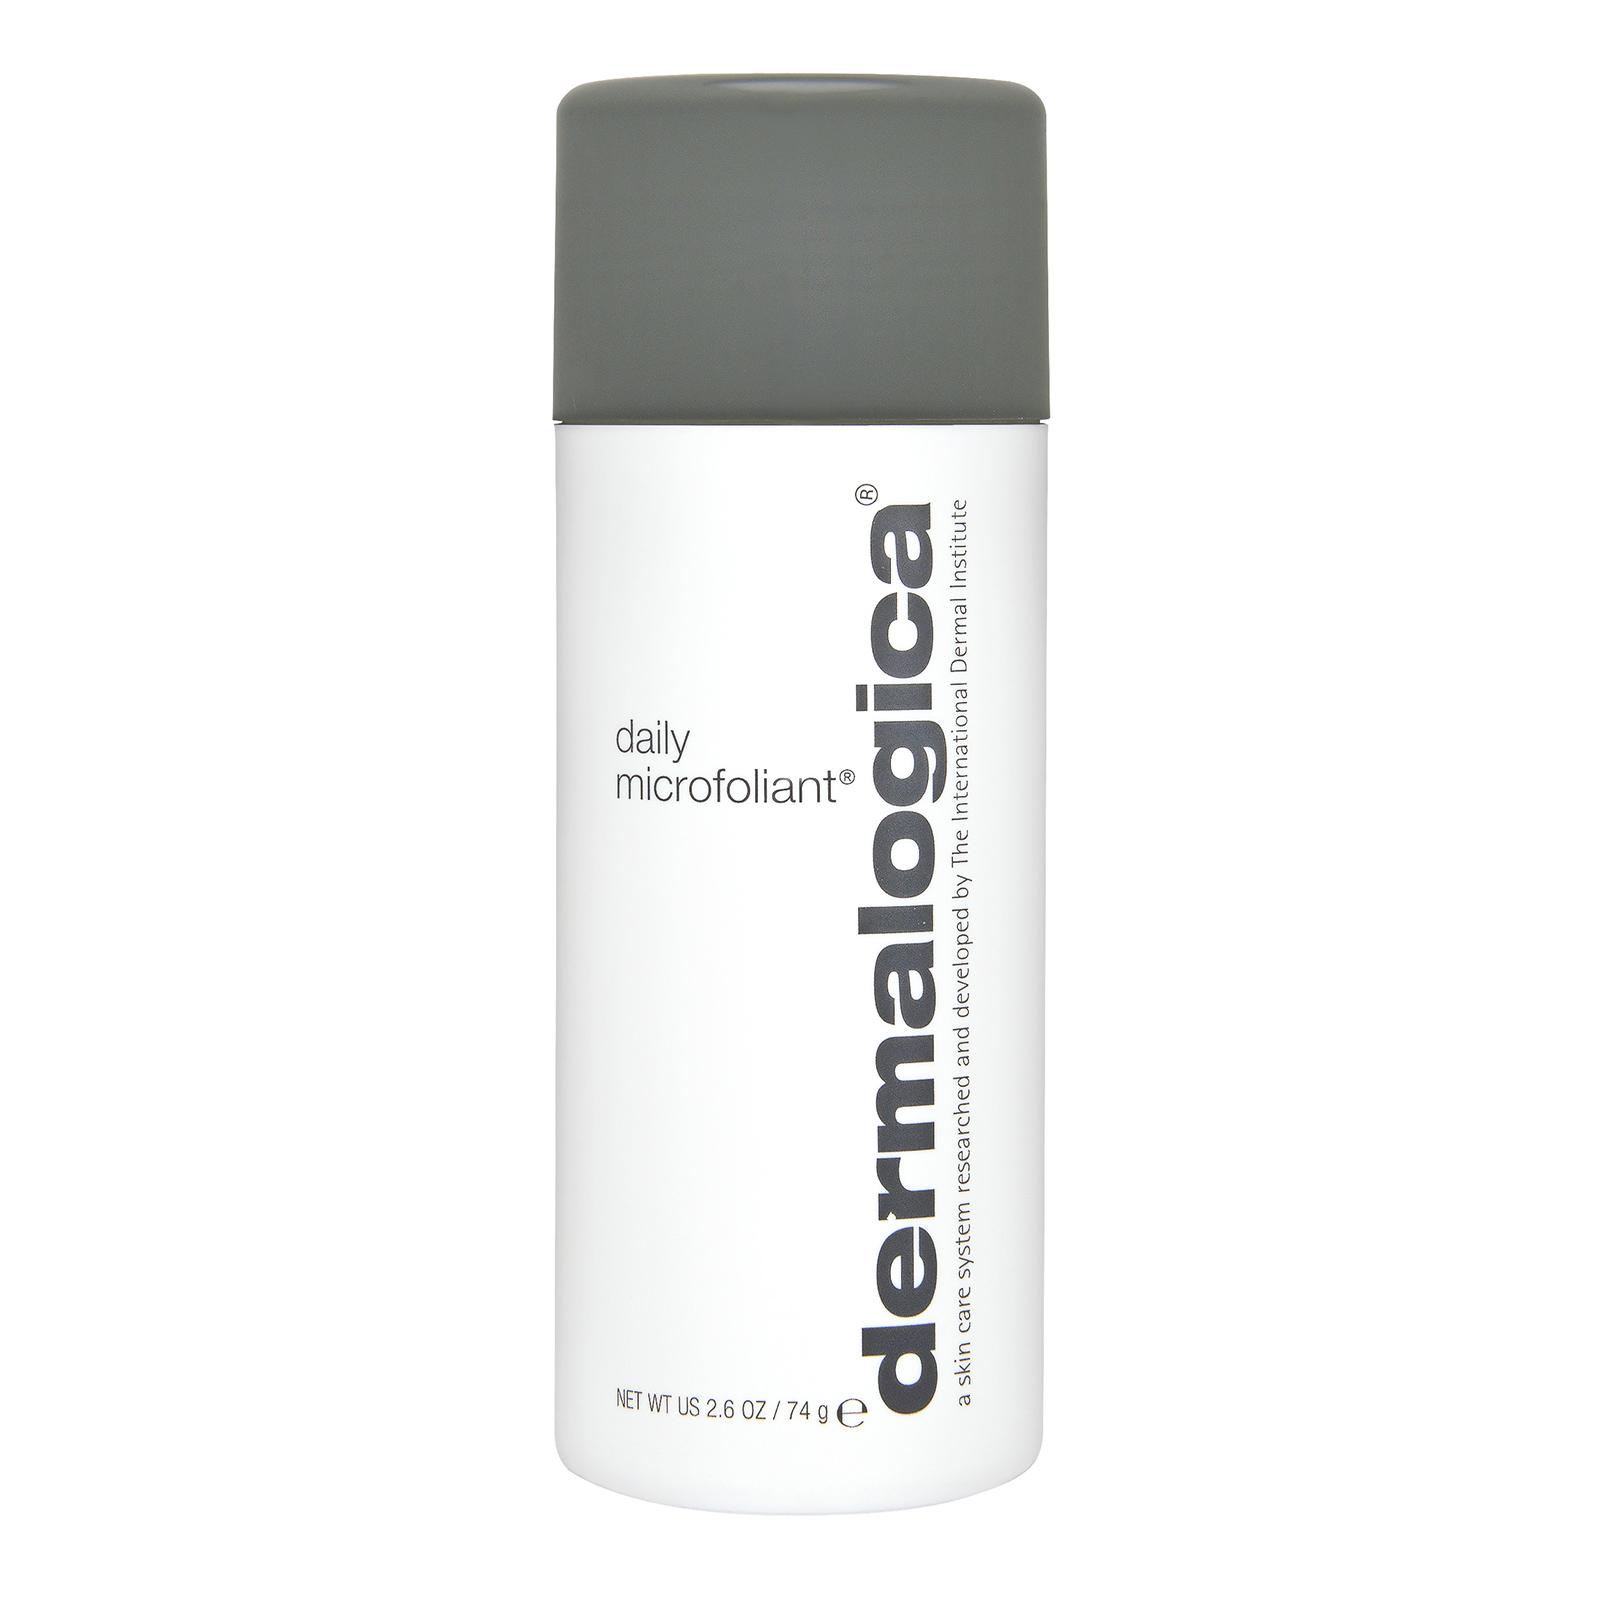 Dermalogica  Daily Microfoliant 2.5oz, 75ml